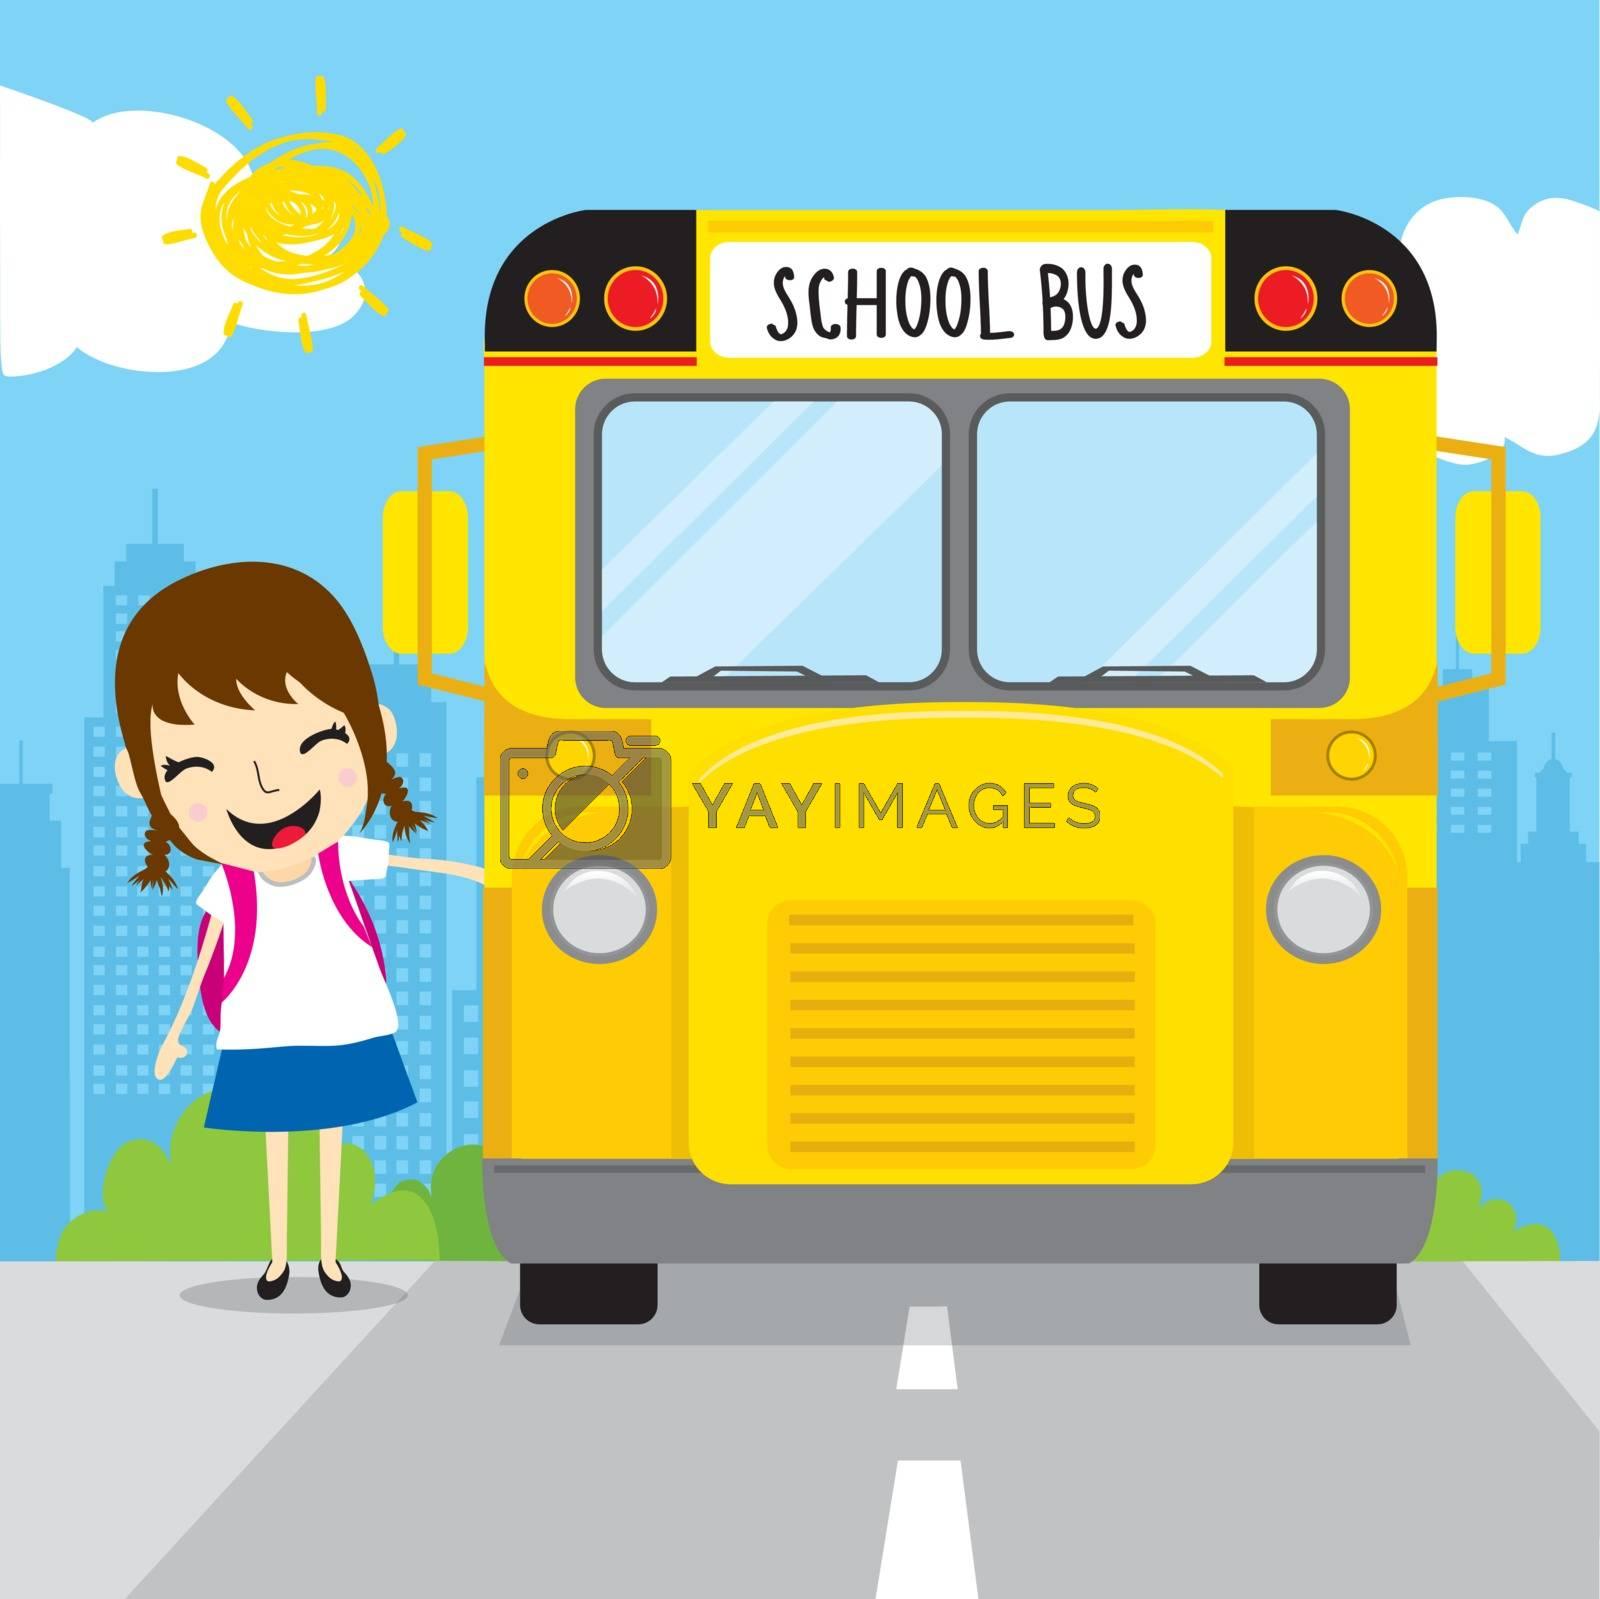 Girl kid student get on school bus in the morning cartoon vector